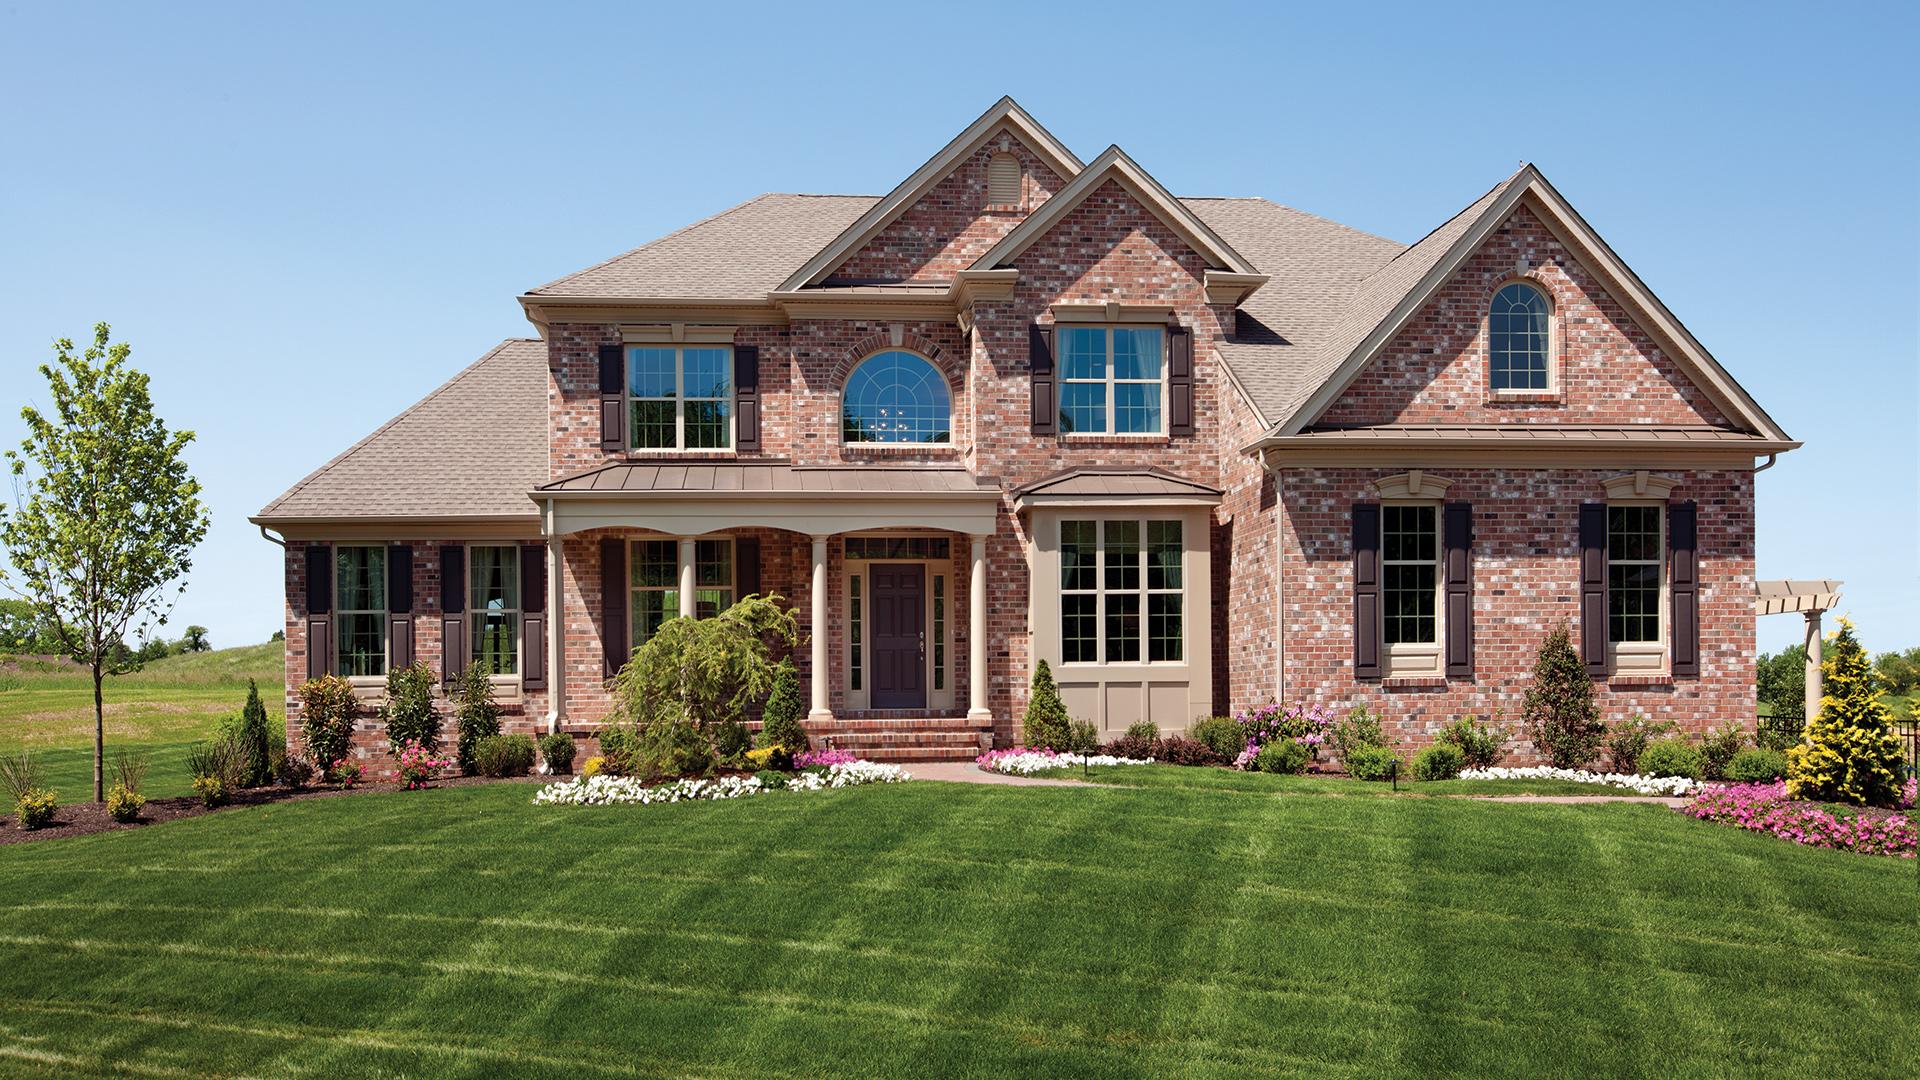 Yardley pa new homes for sale oakmont for The oakmont